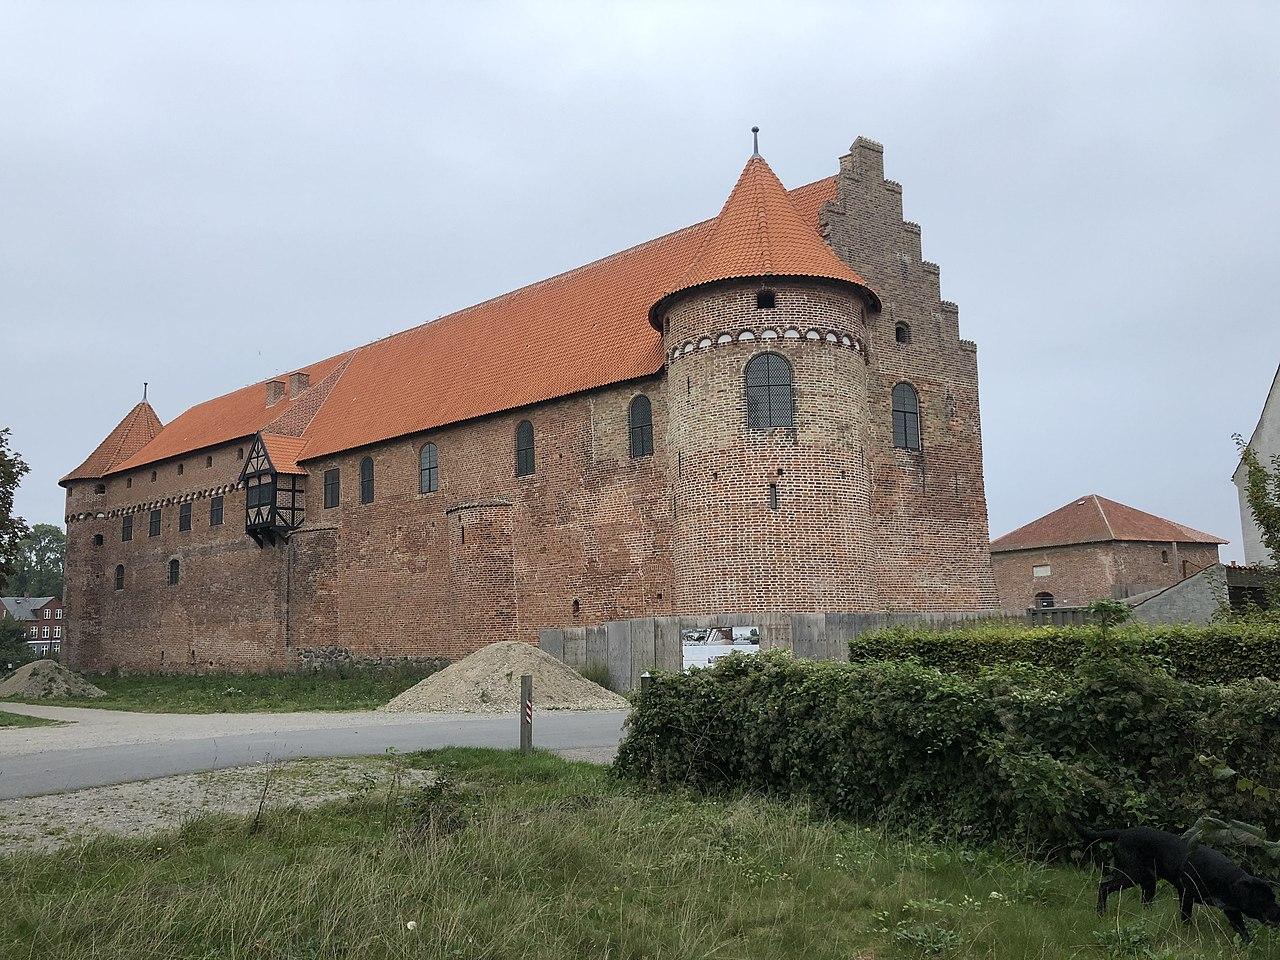 Nyborg: Things to Do in Nyborg, Denmark